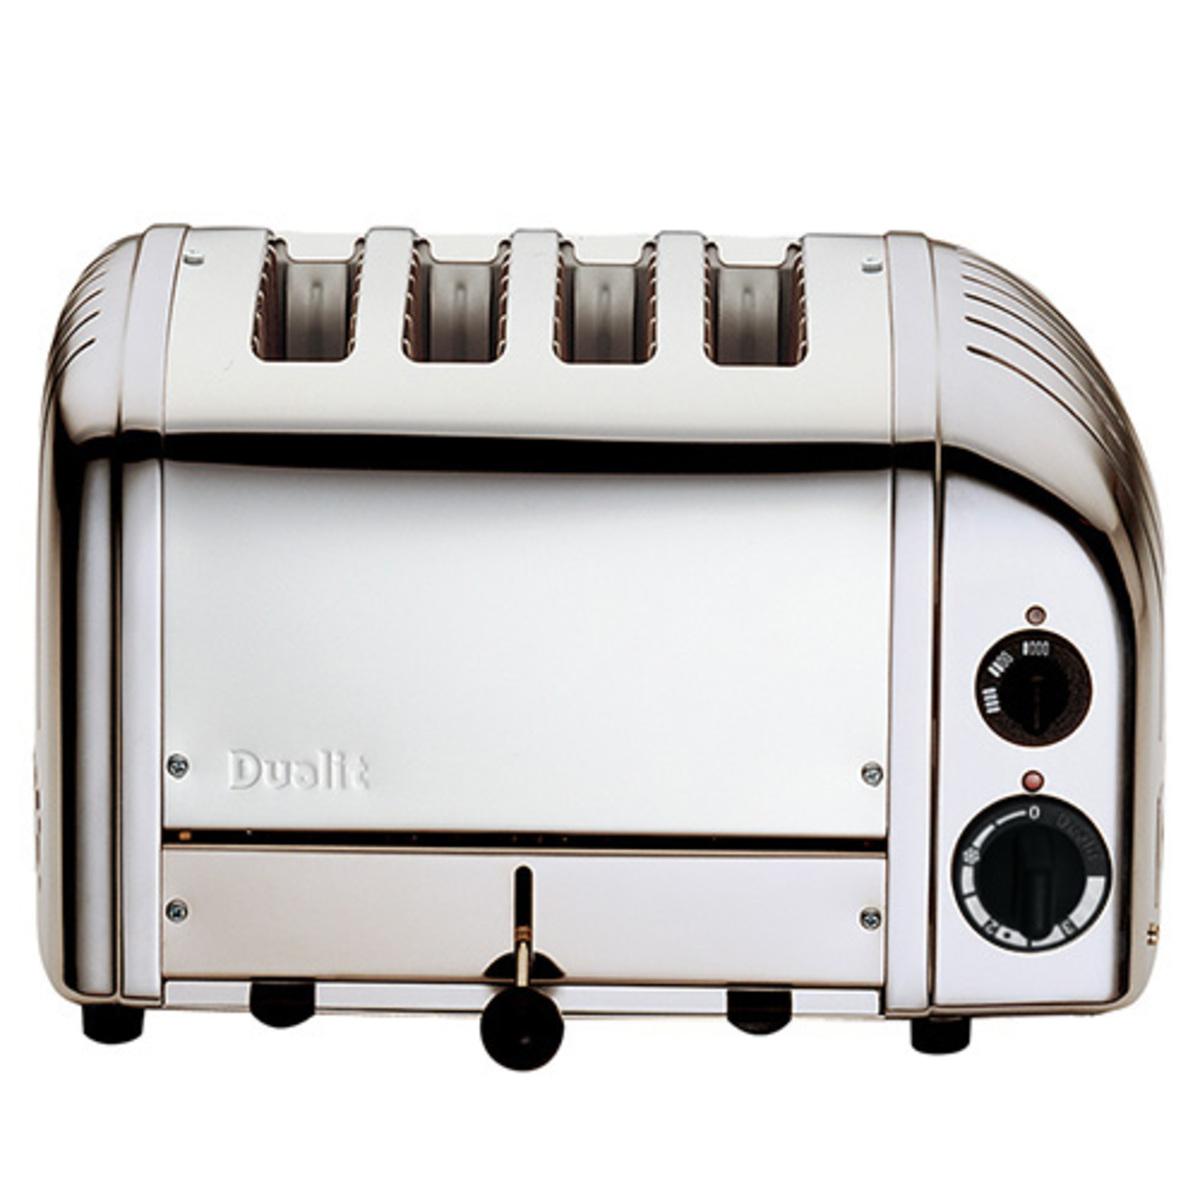 Dualit 40378 Classic Vario AWS 4 Slot Toaster, Polished